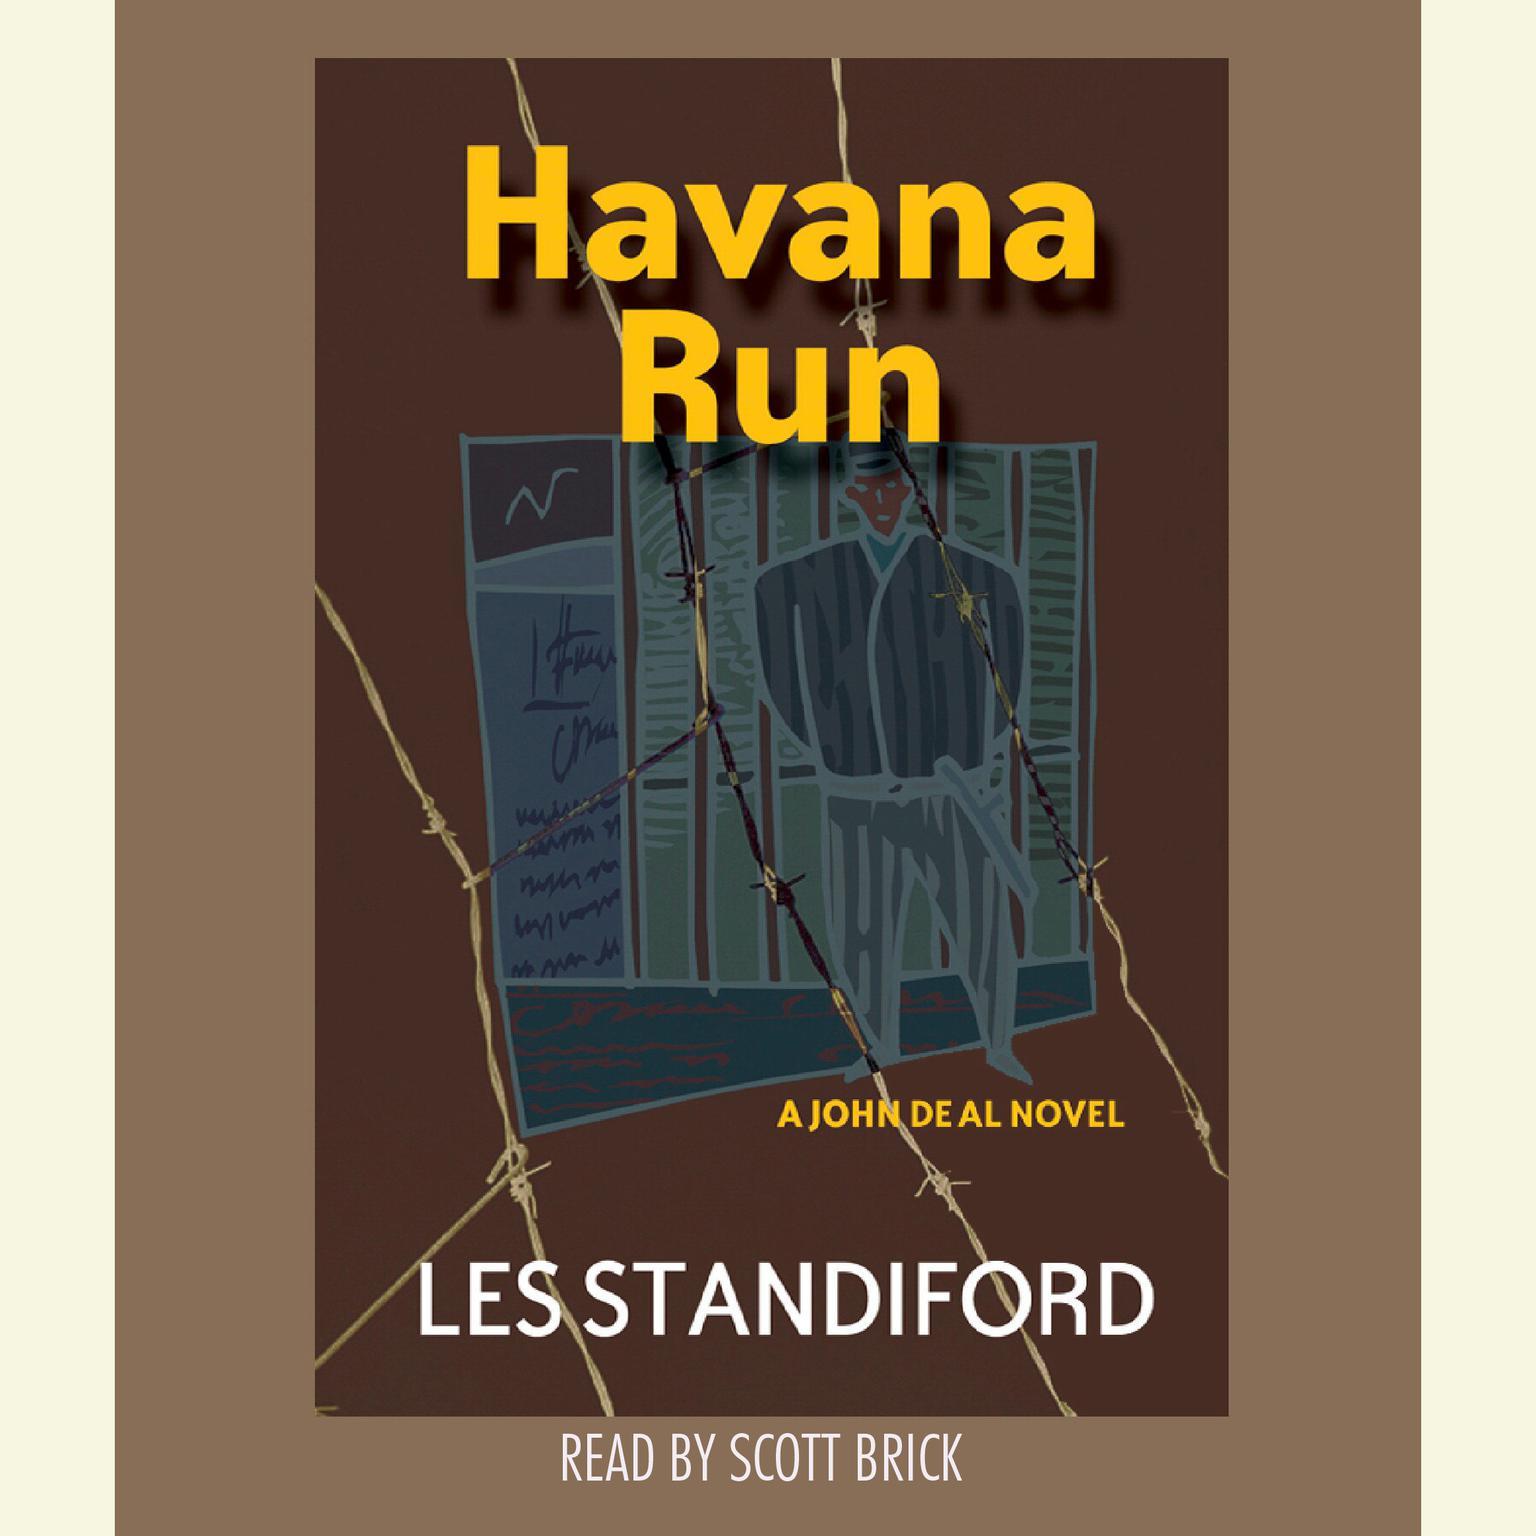 Havana Run Audiobook, by Les Standiford